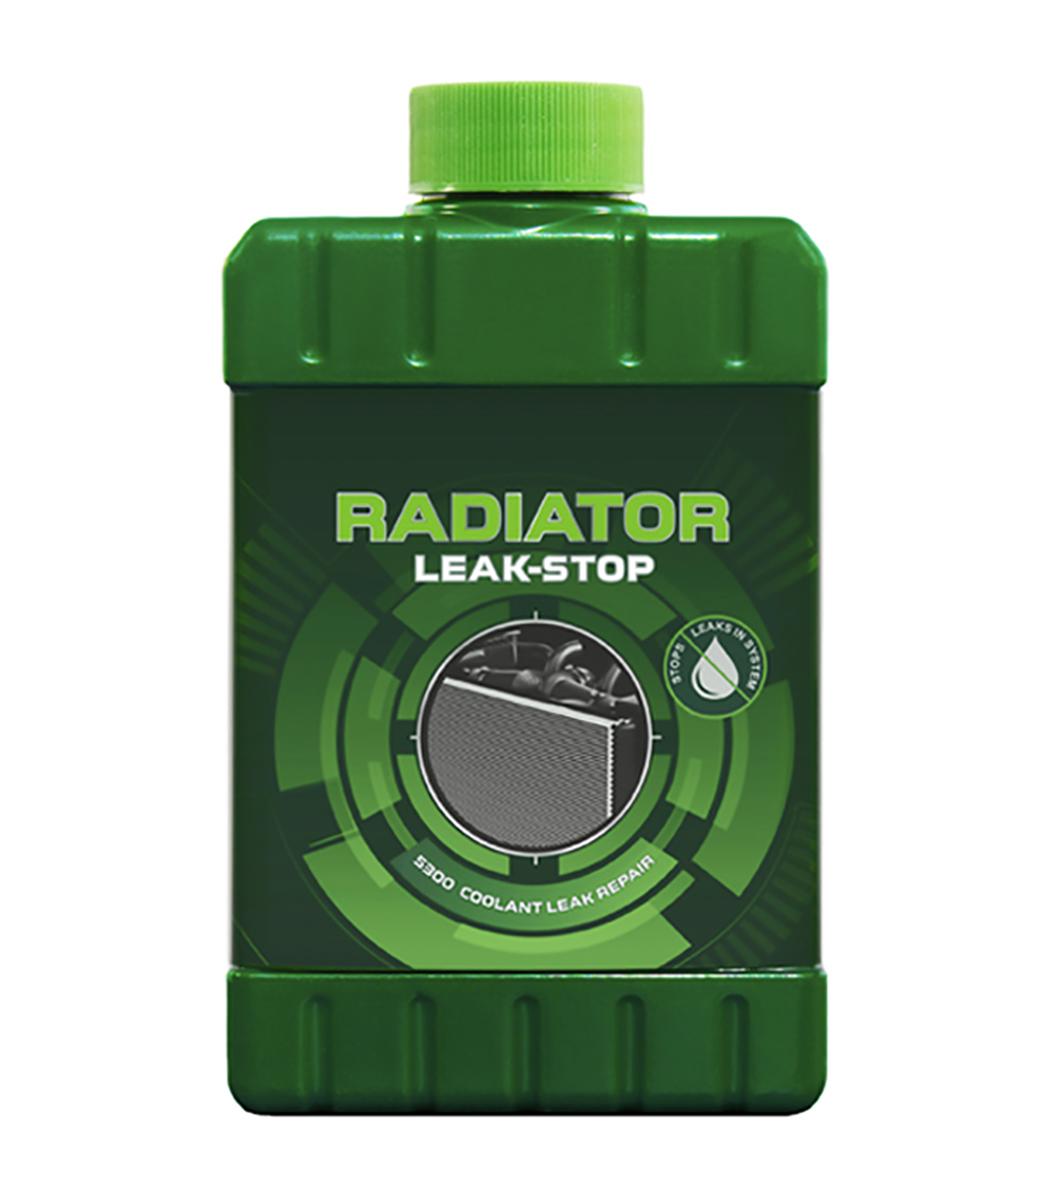 RADIATOR LEAK-STOP